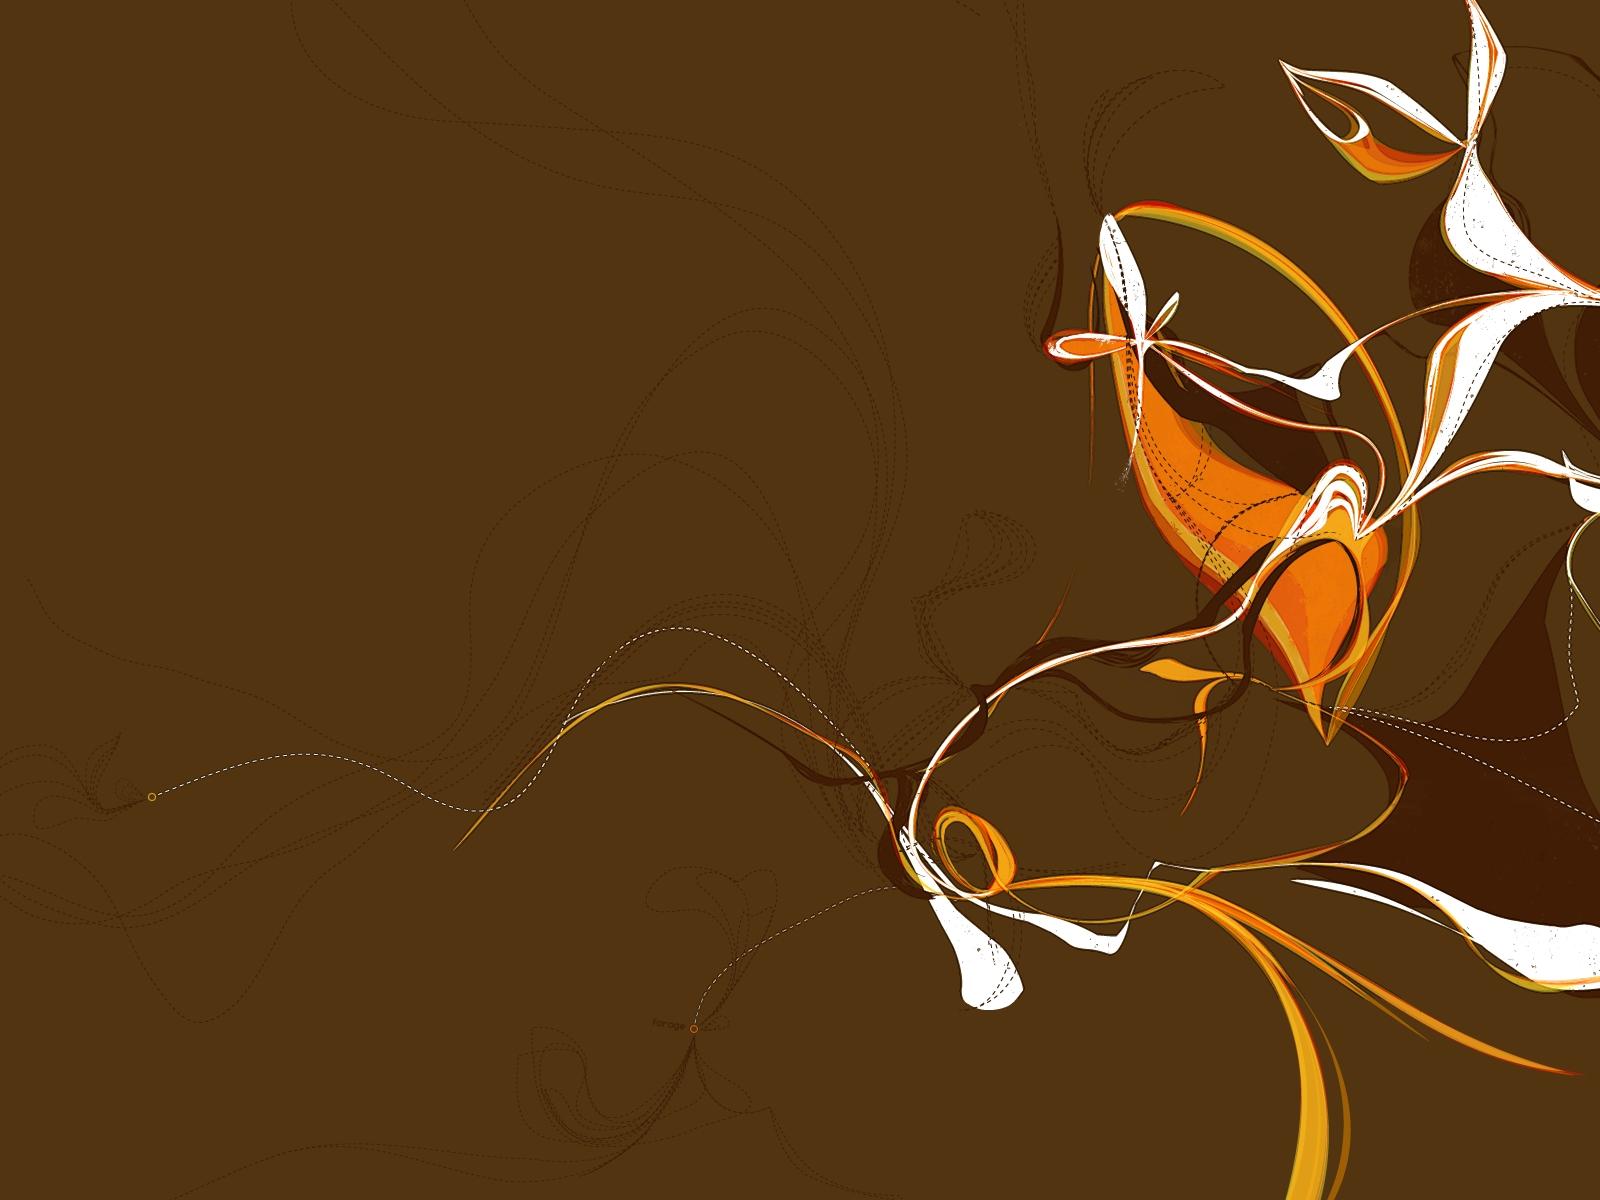 Brown Design Wallpaper   Brown Wallpaper 28317225 1600x1200